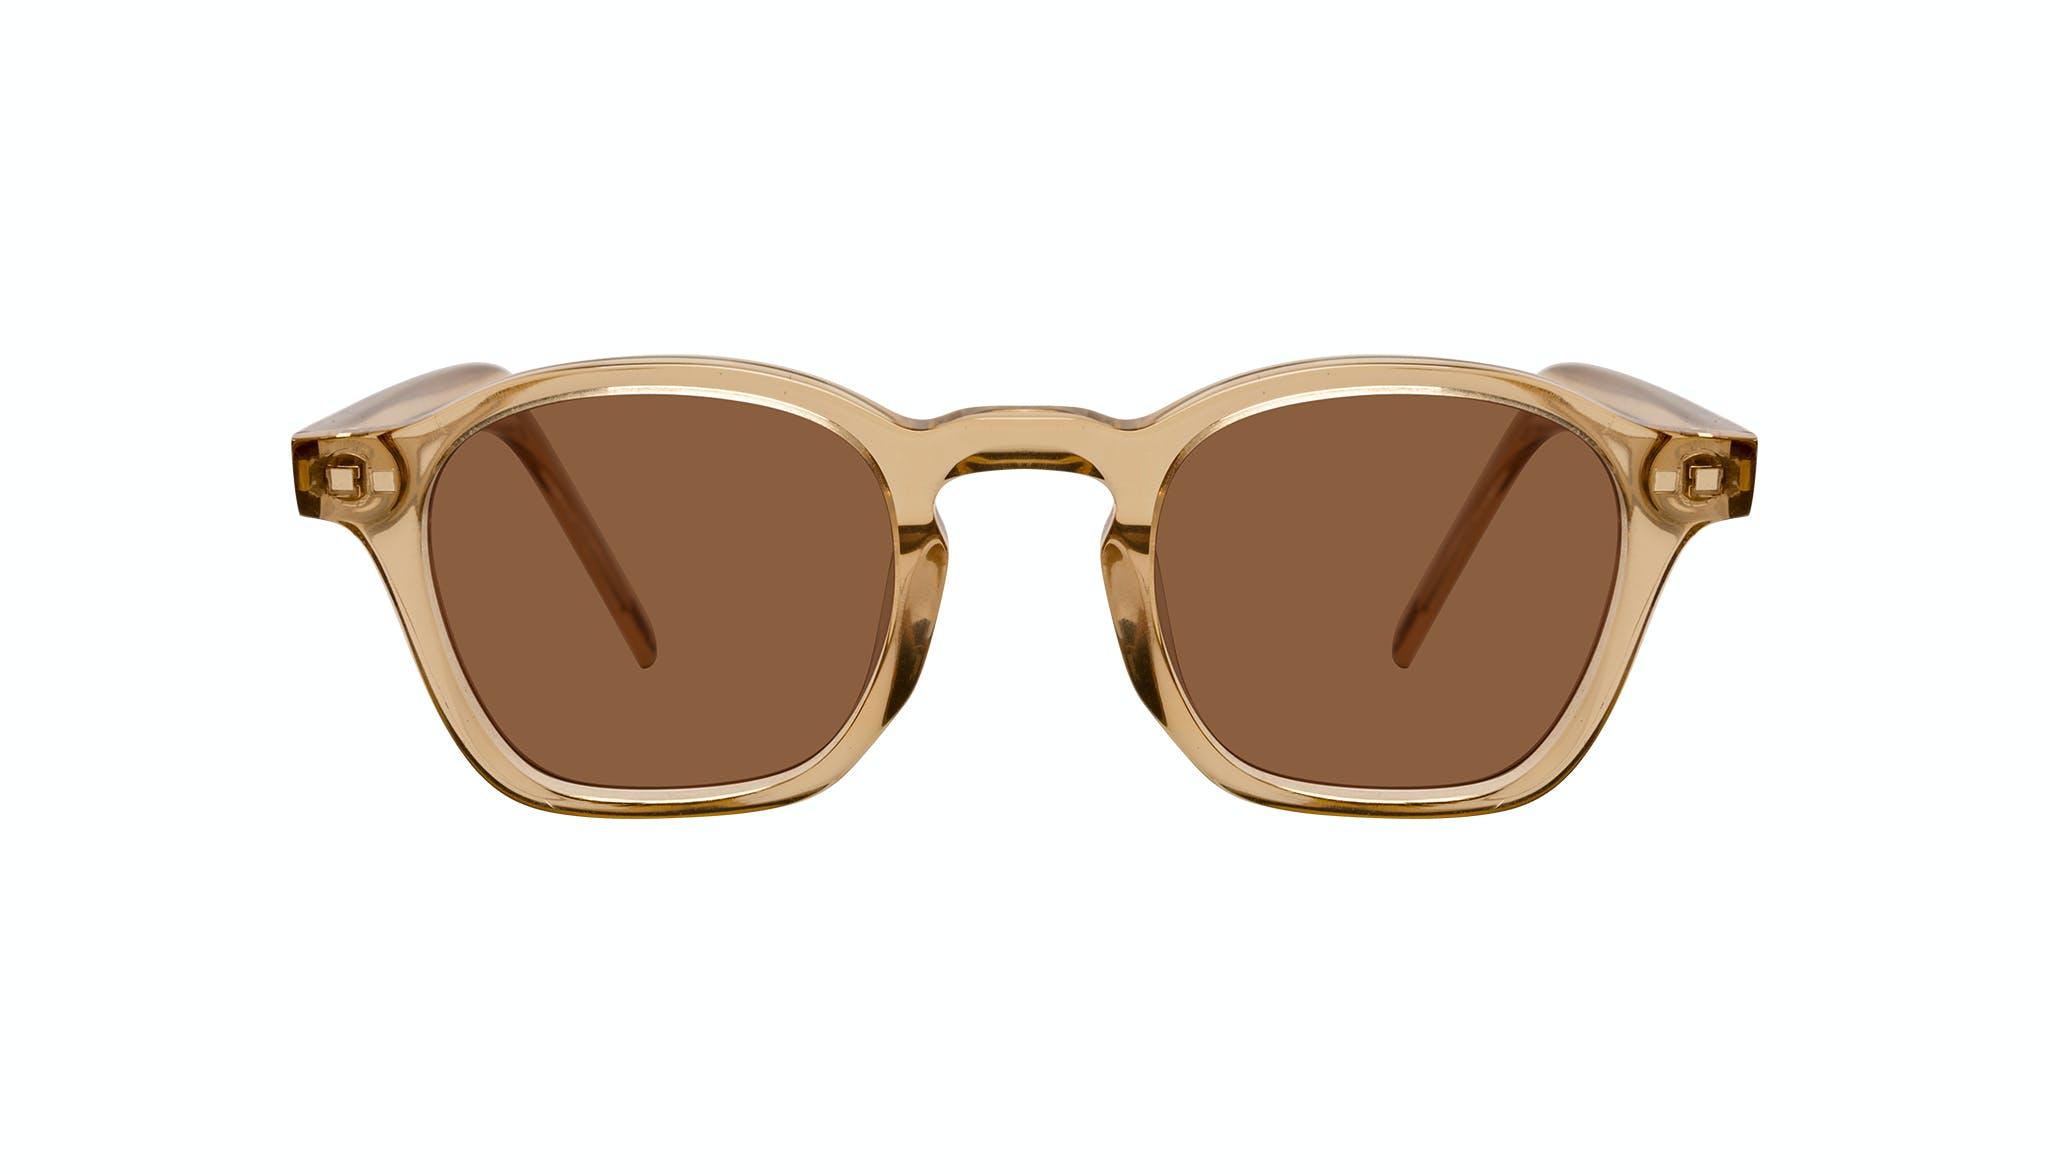 Affordable Fashion Glasses Square Sunglasses Men Brisk Golden